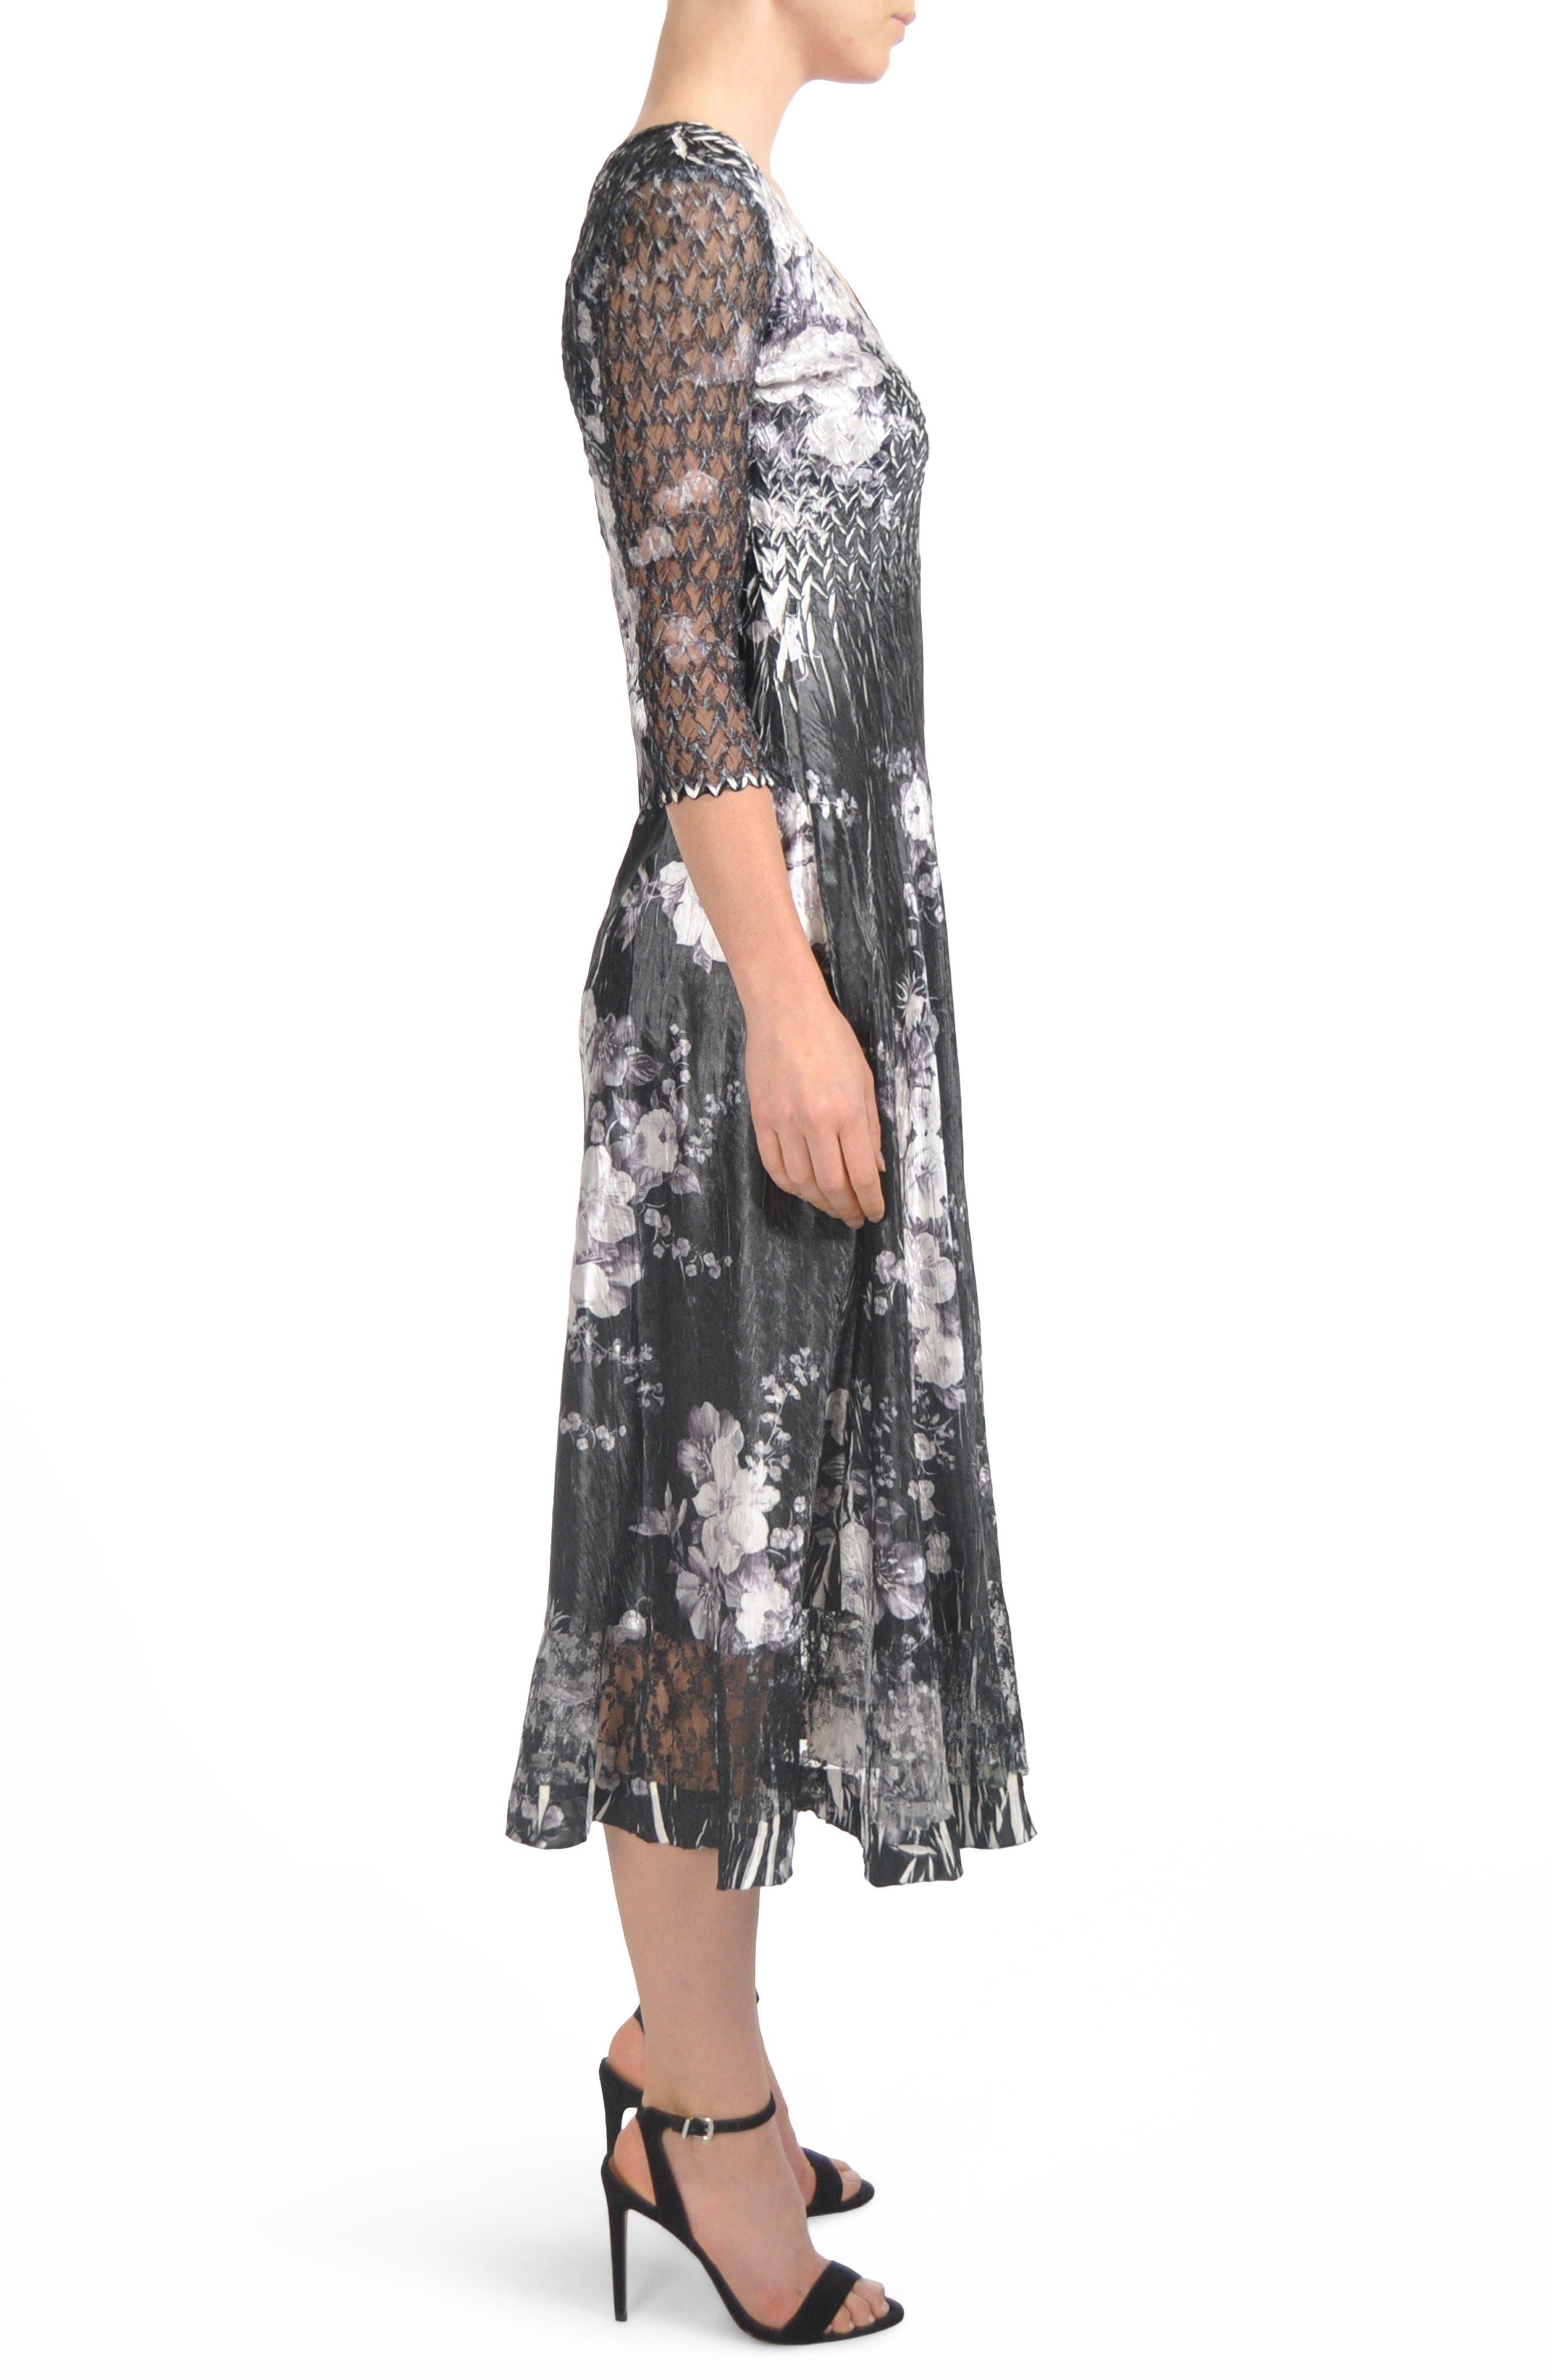 Floral Charmeuse & Lace Tea Length Dress,                             Alternate thumbnail 3, color,                             Eclipse Meadow